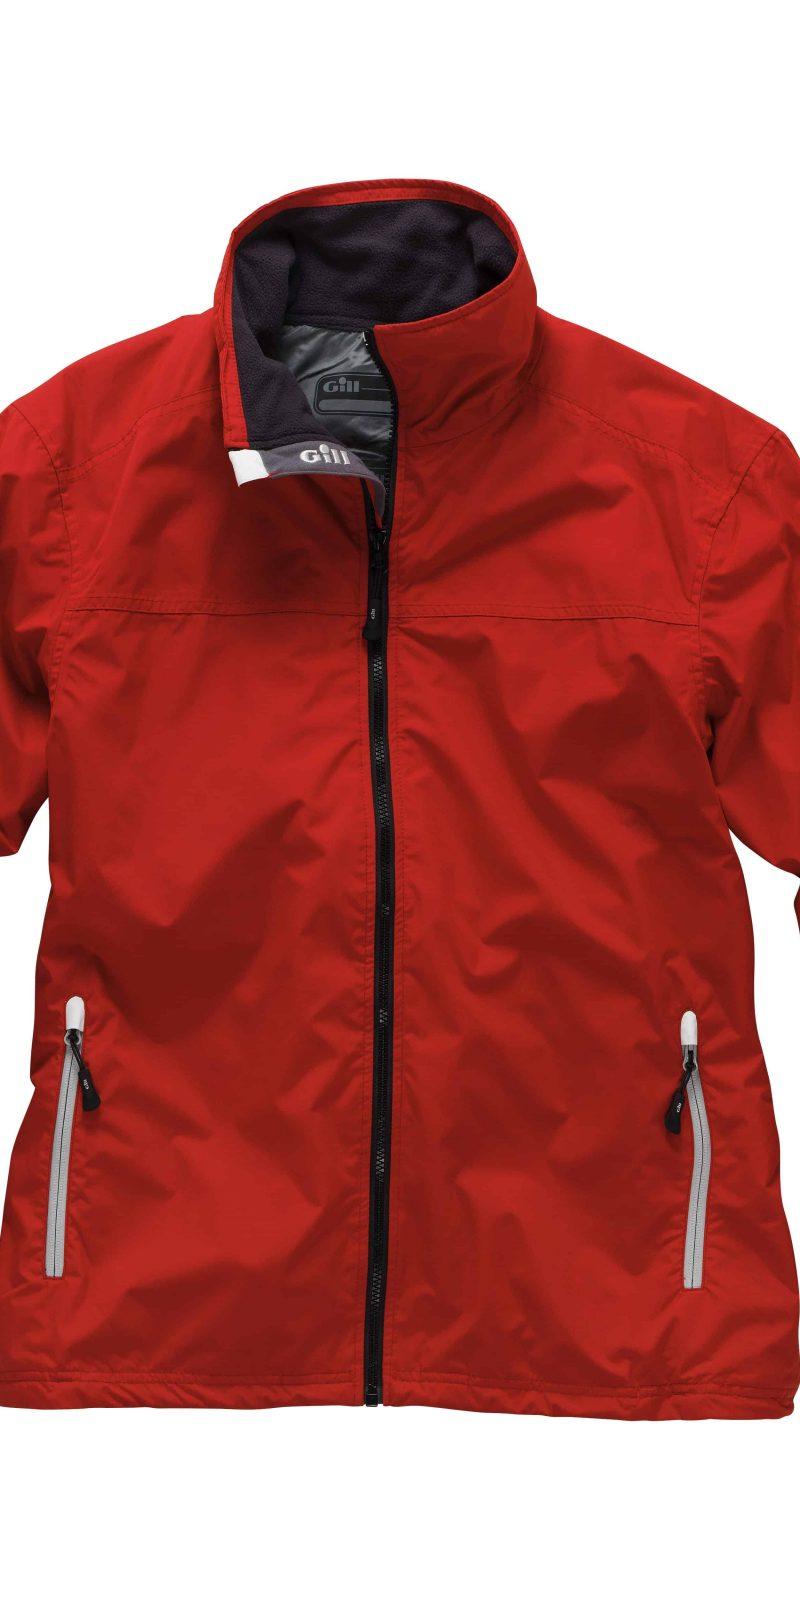 Gill – Mens Crew Jacket